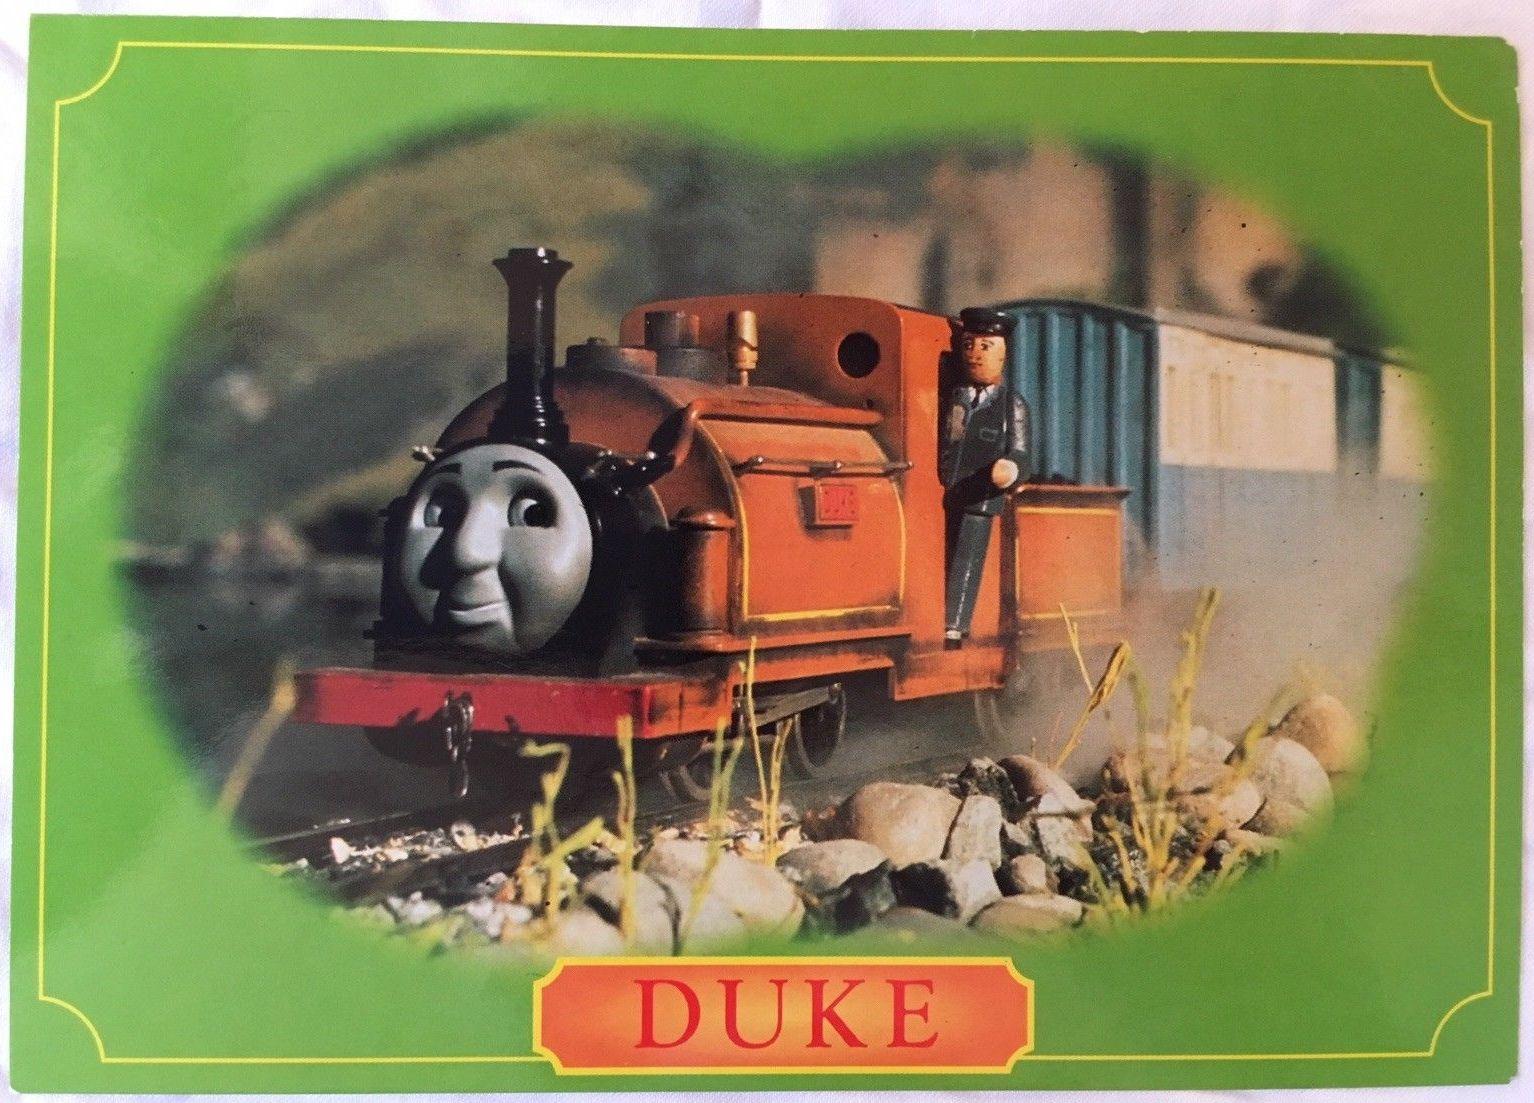 File:DukePostcard.jpeg